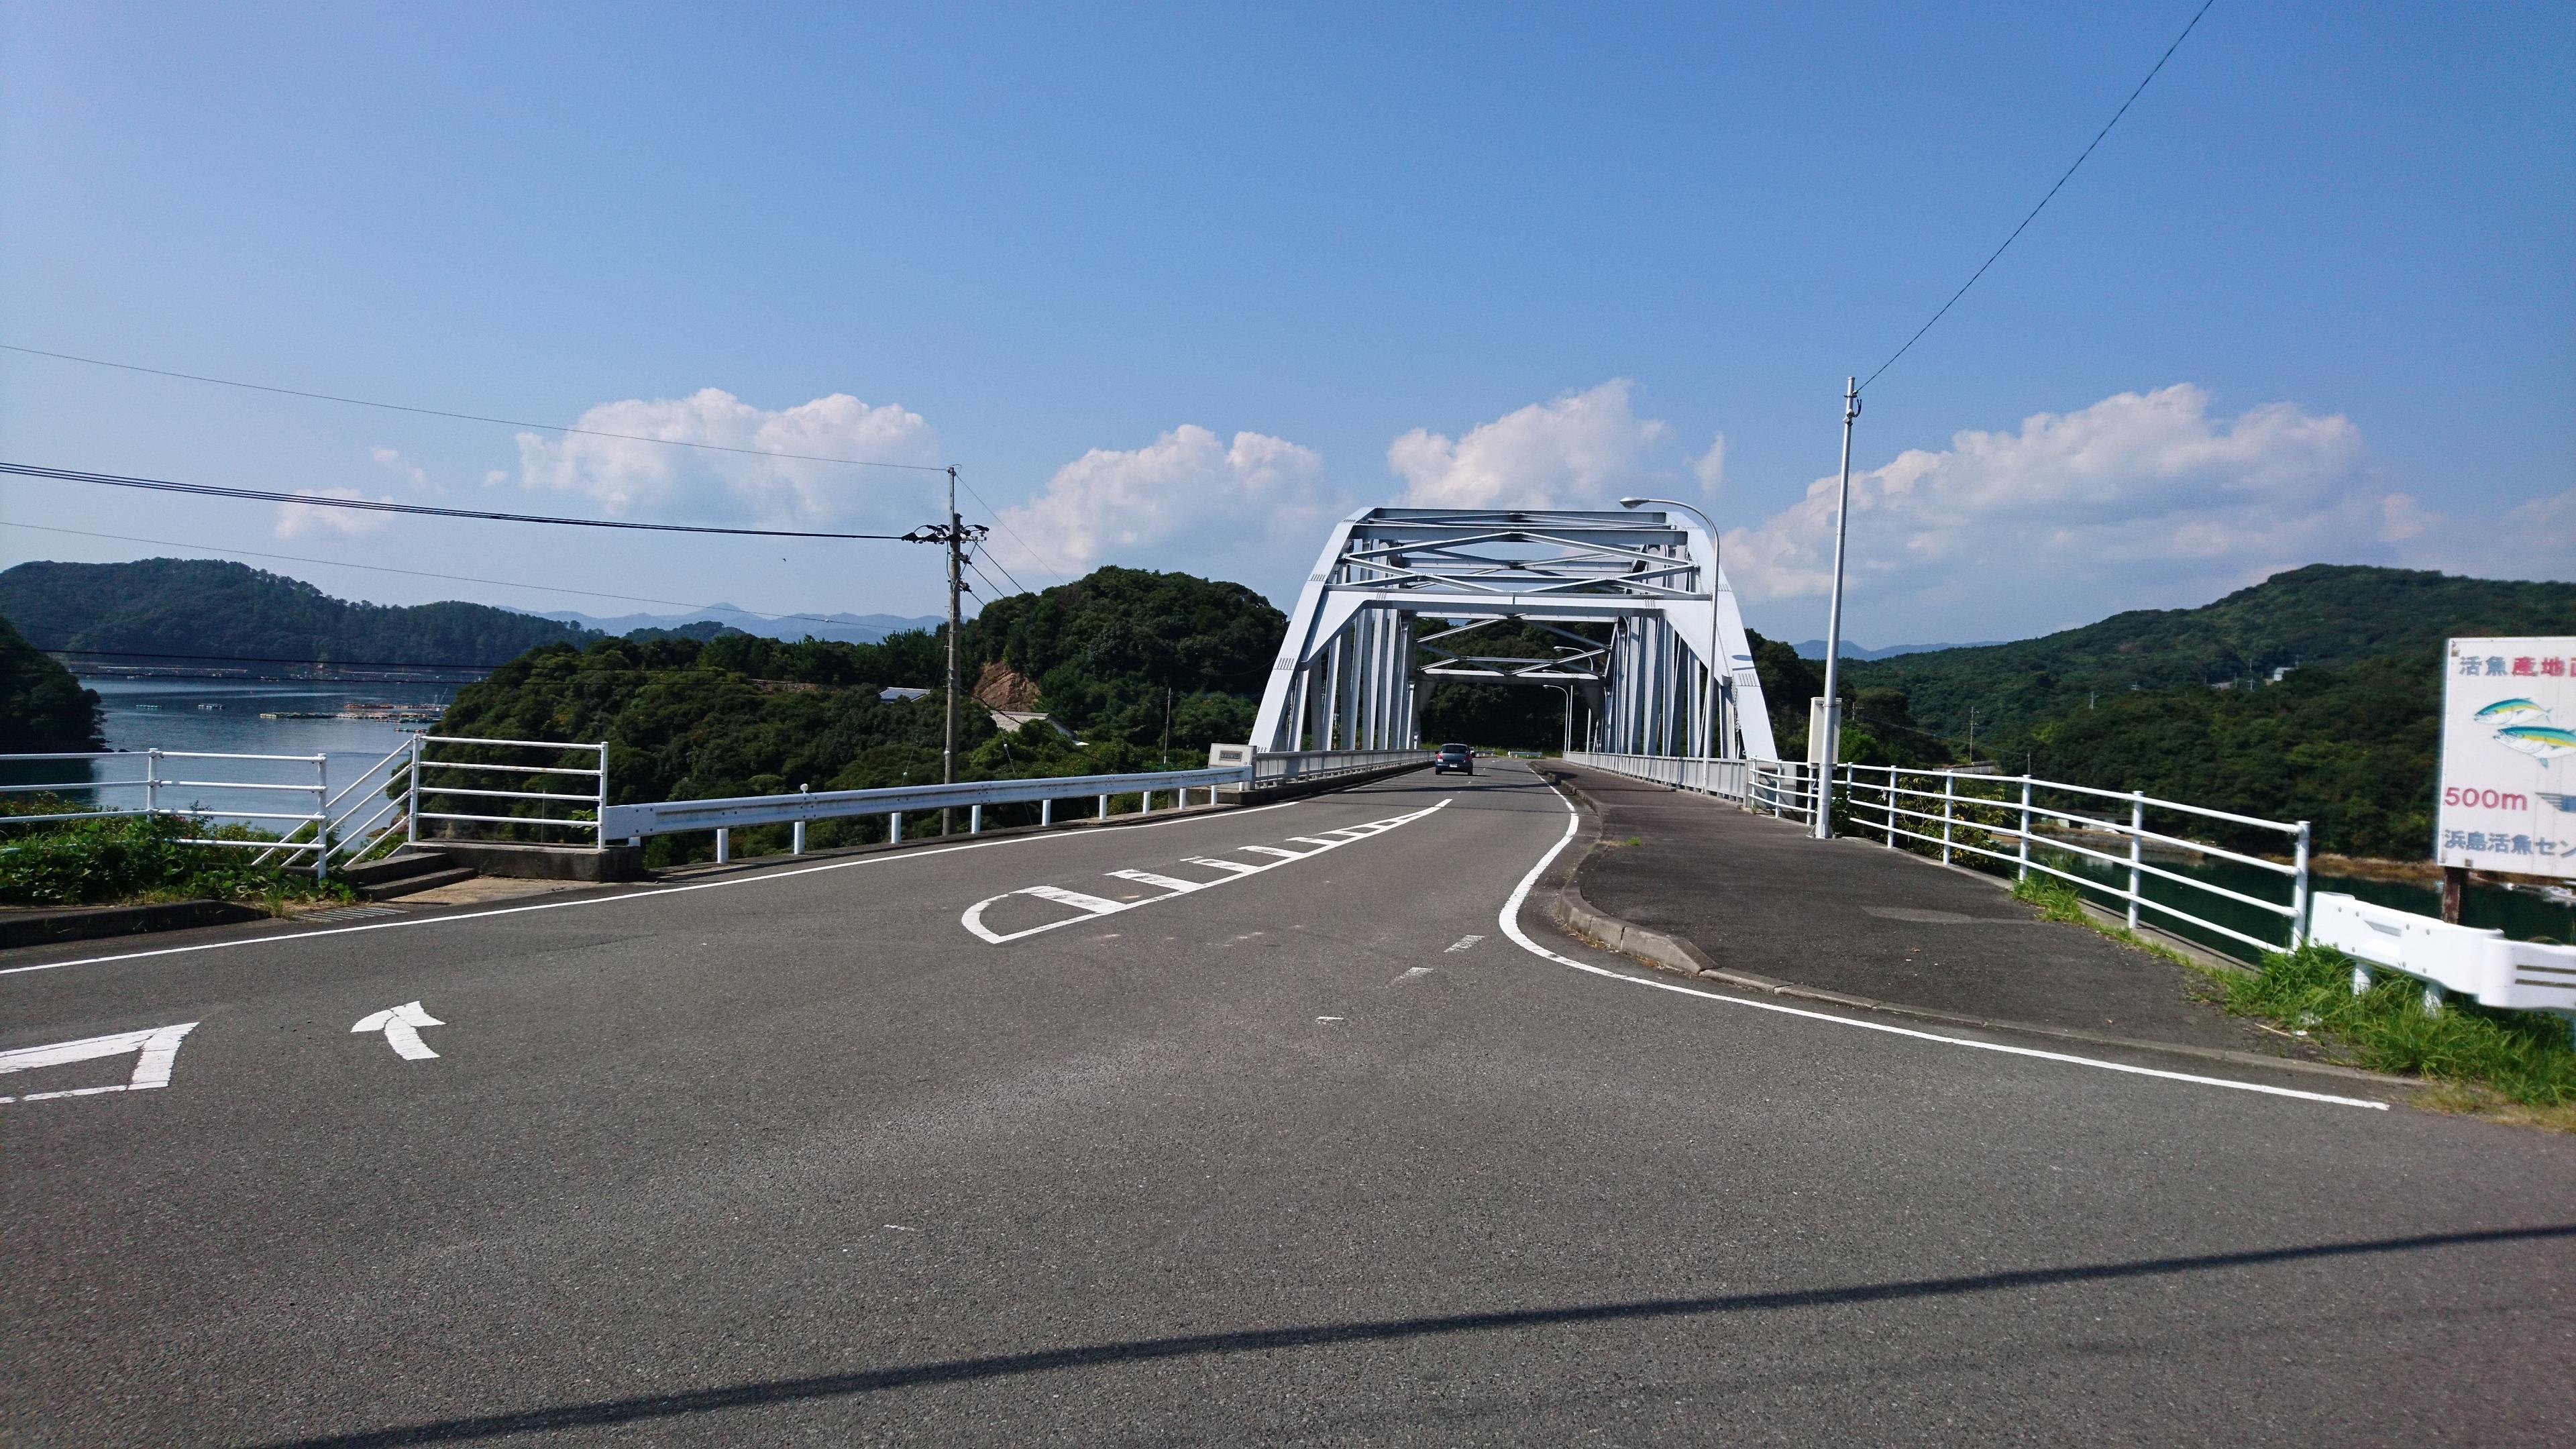 http://hashiguchi-seikotu.com/blog/about/%E8%AB%B8%E6%B5%A6.JPG